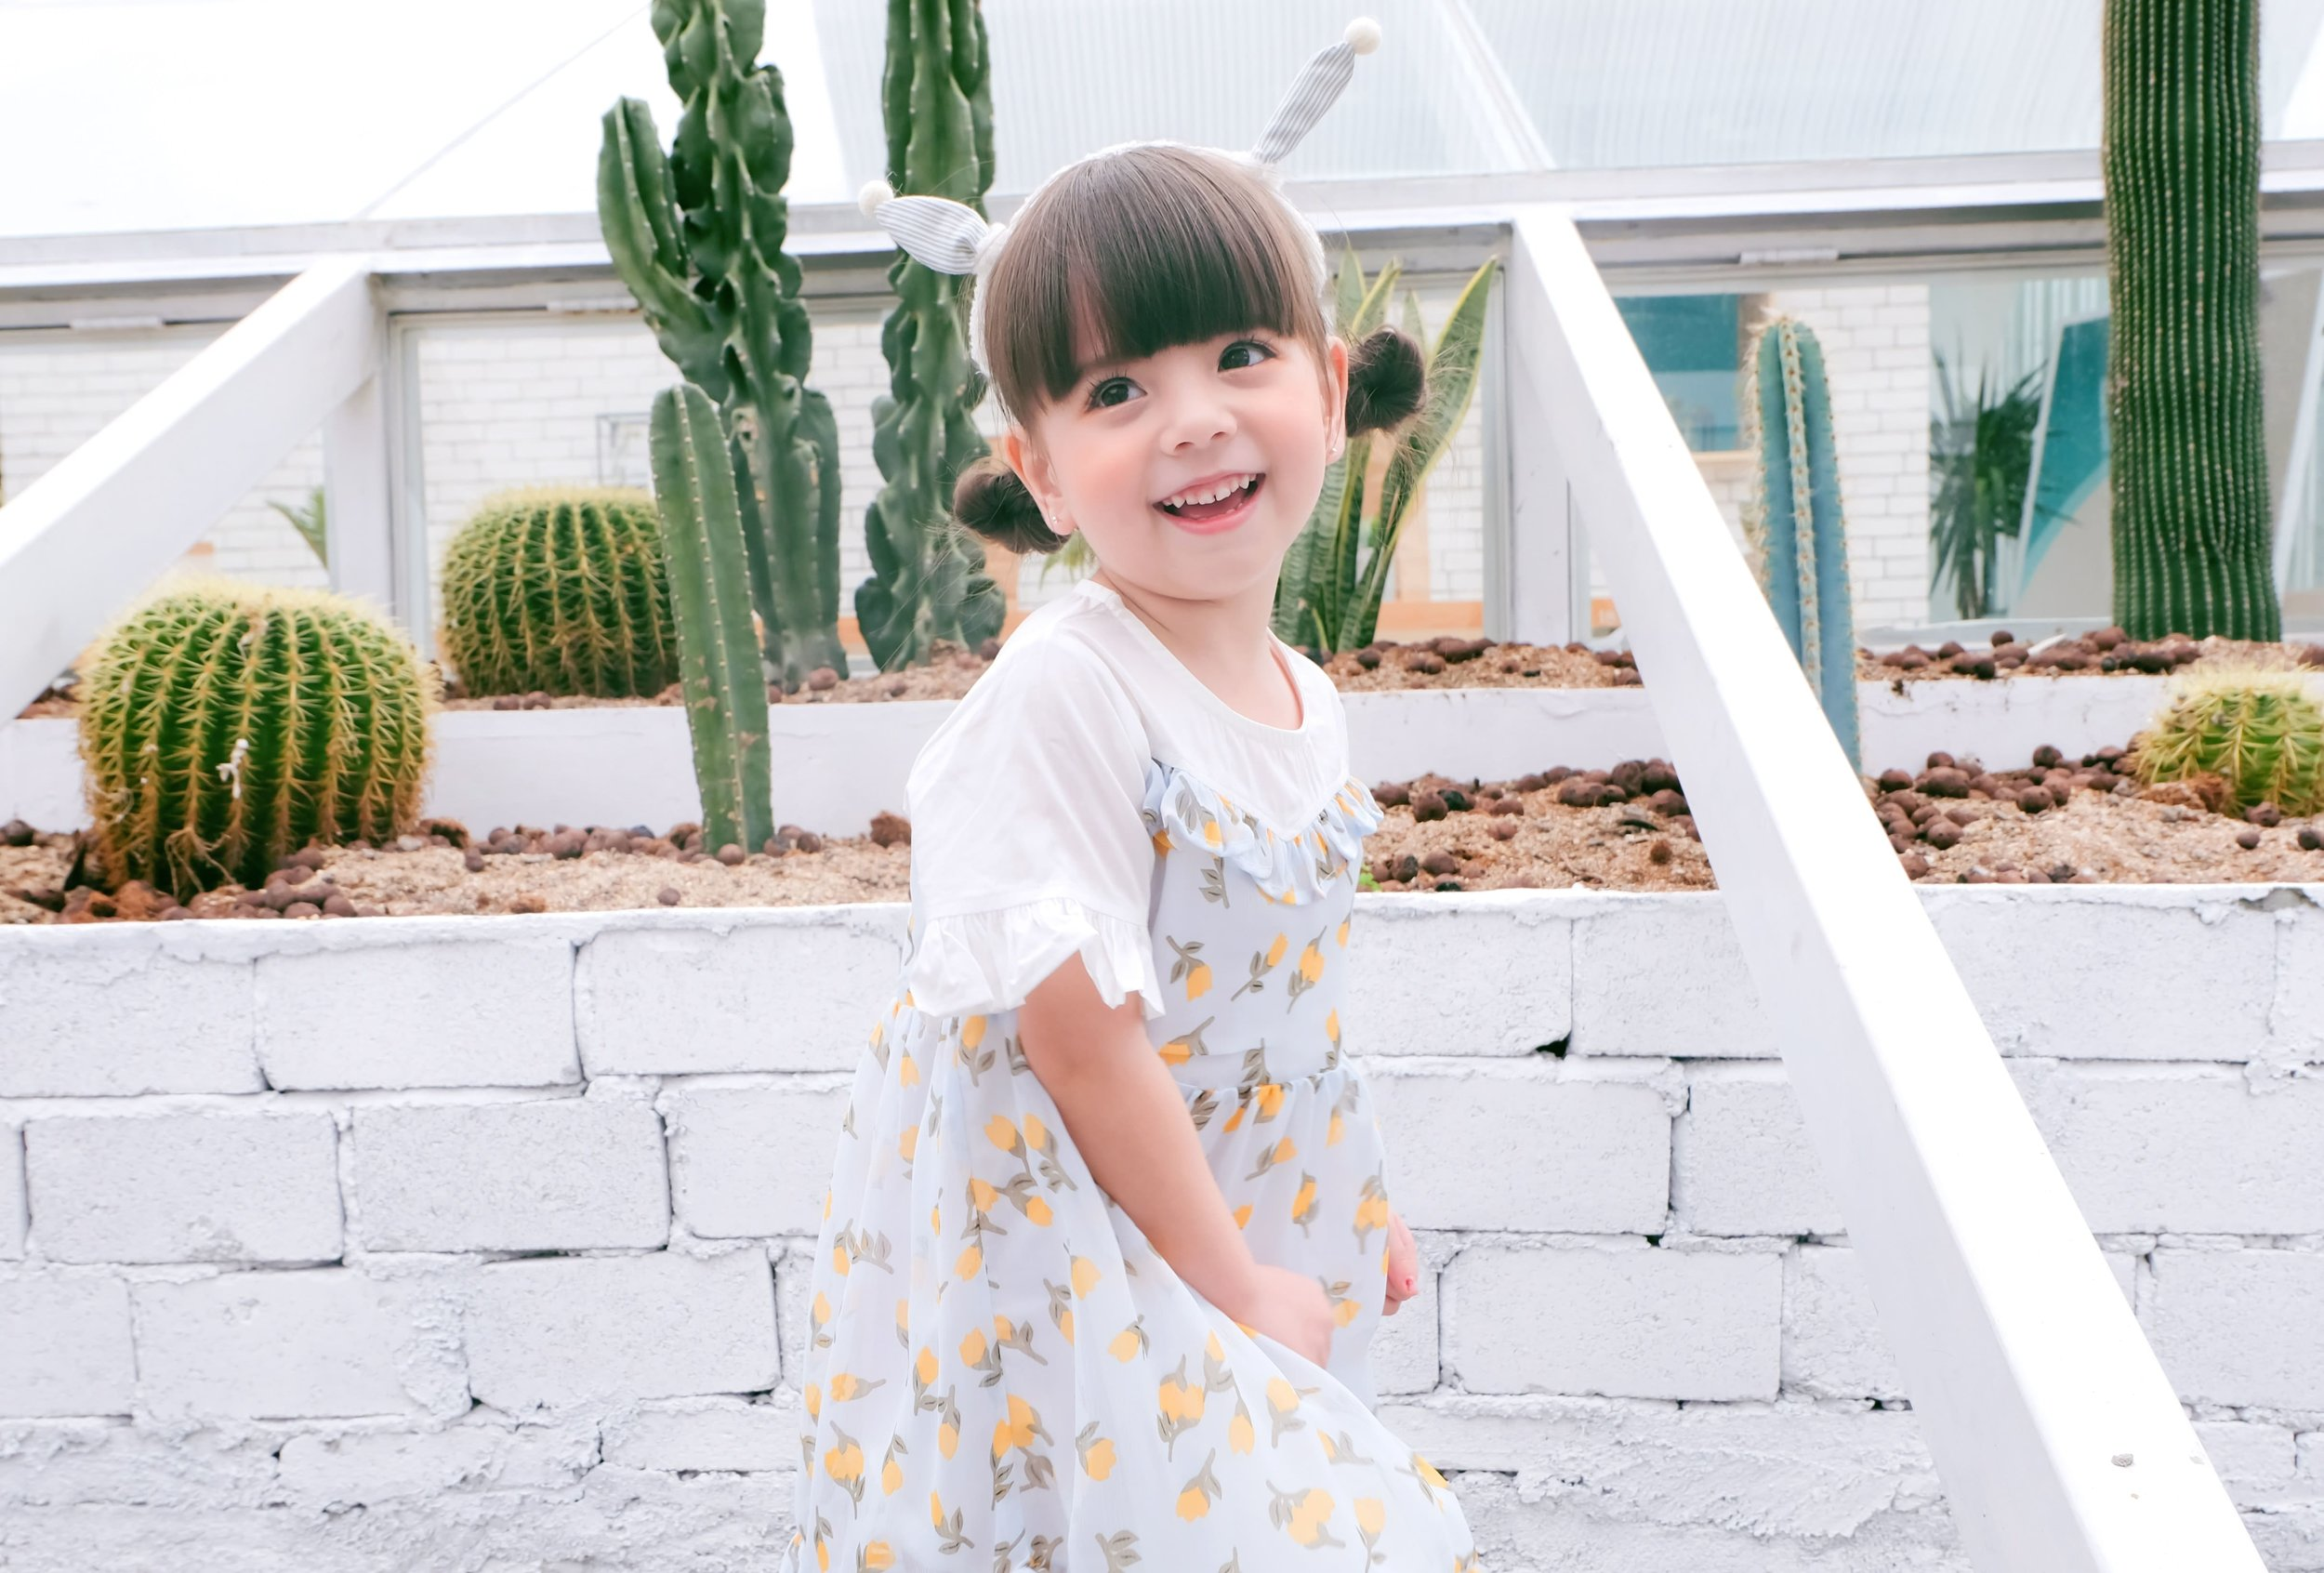 adorable-beautiful-child-1688886-min.jpg